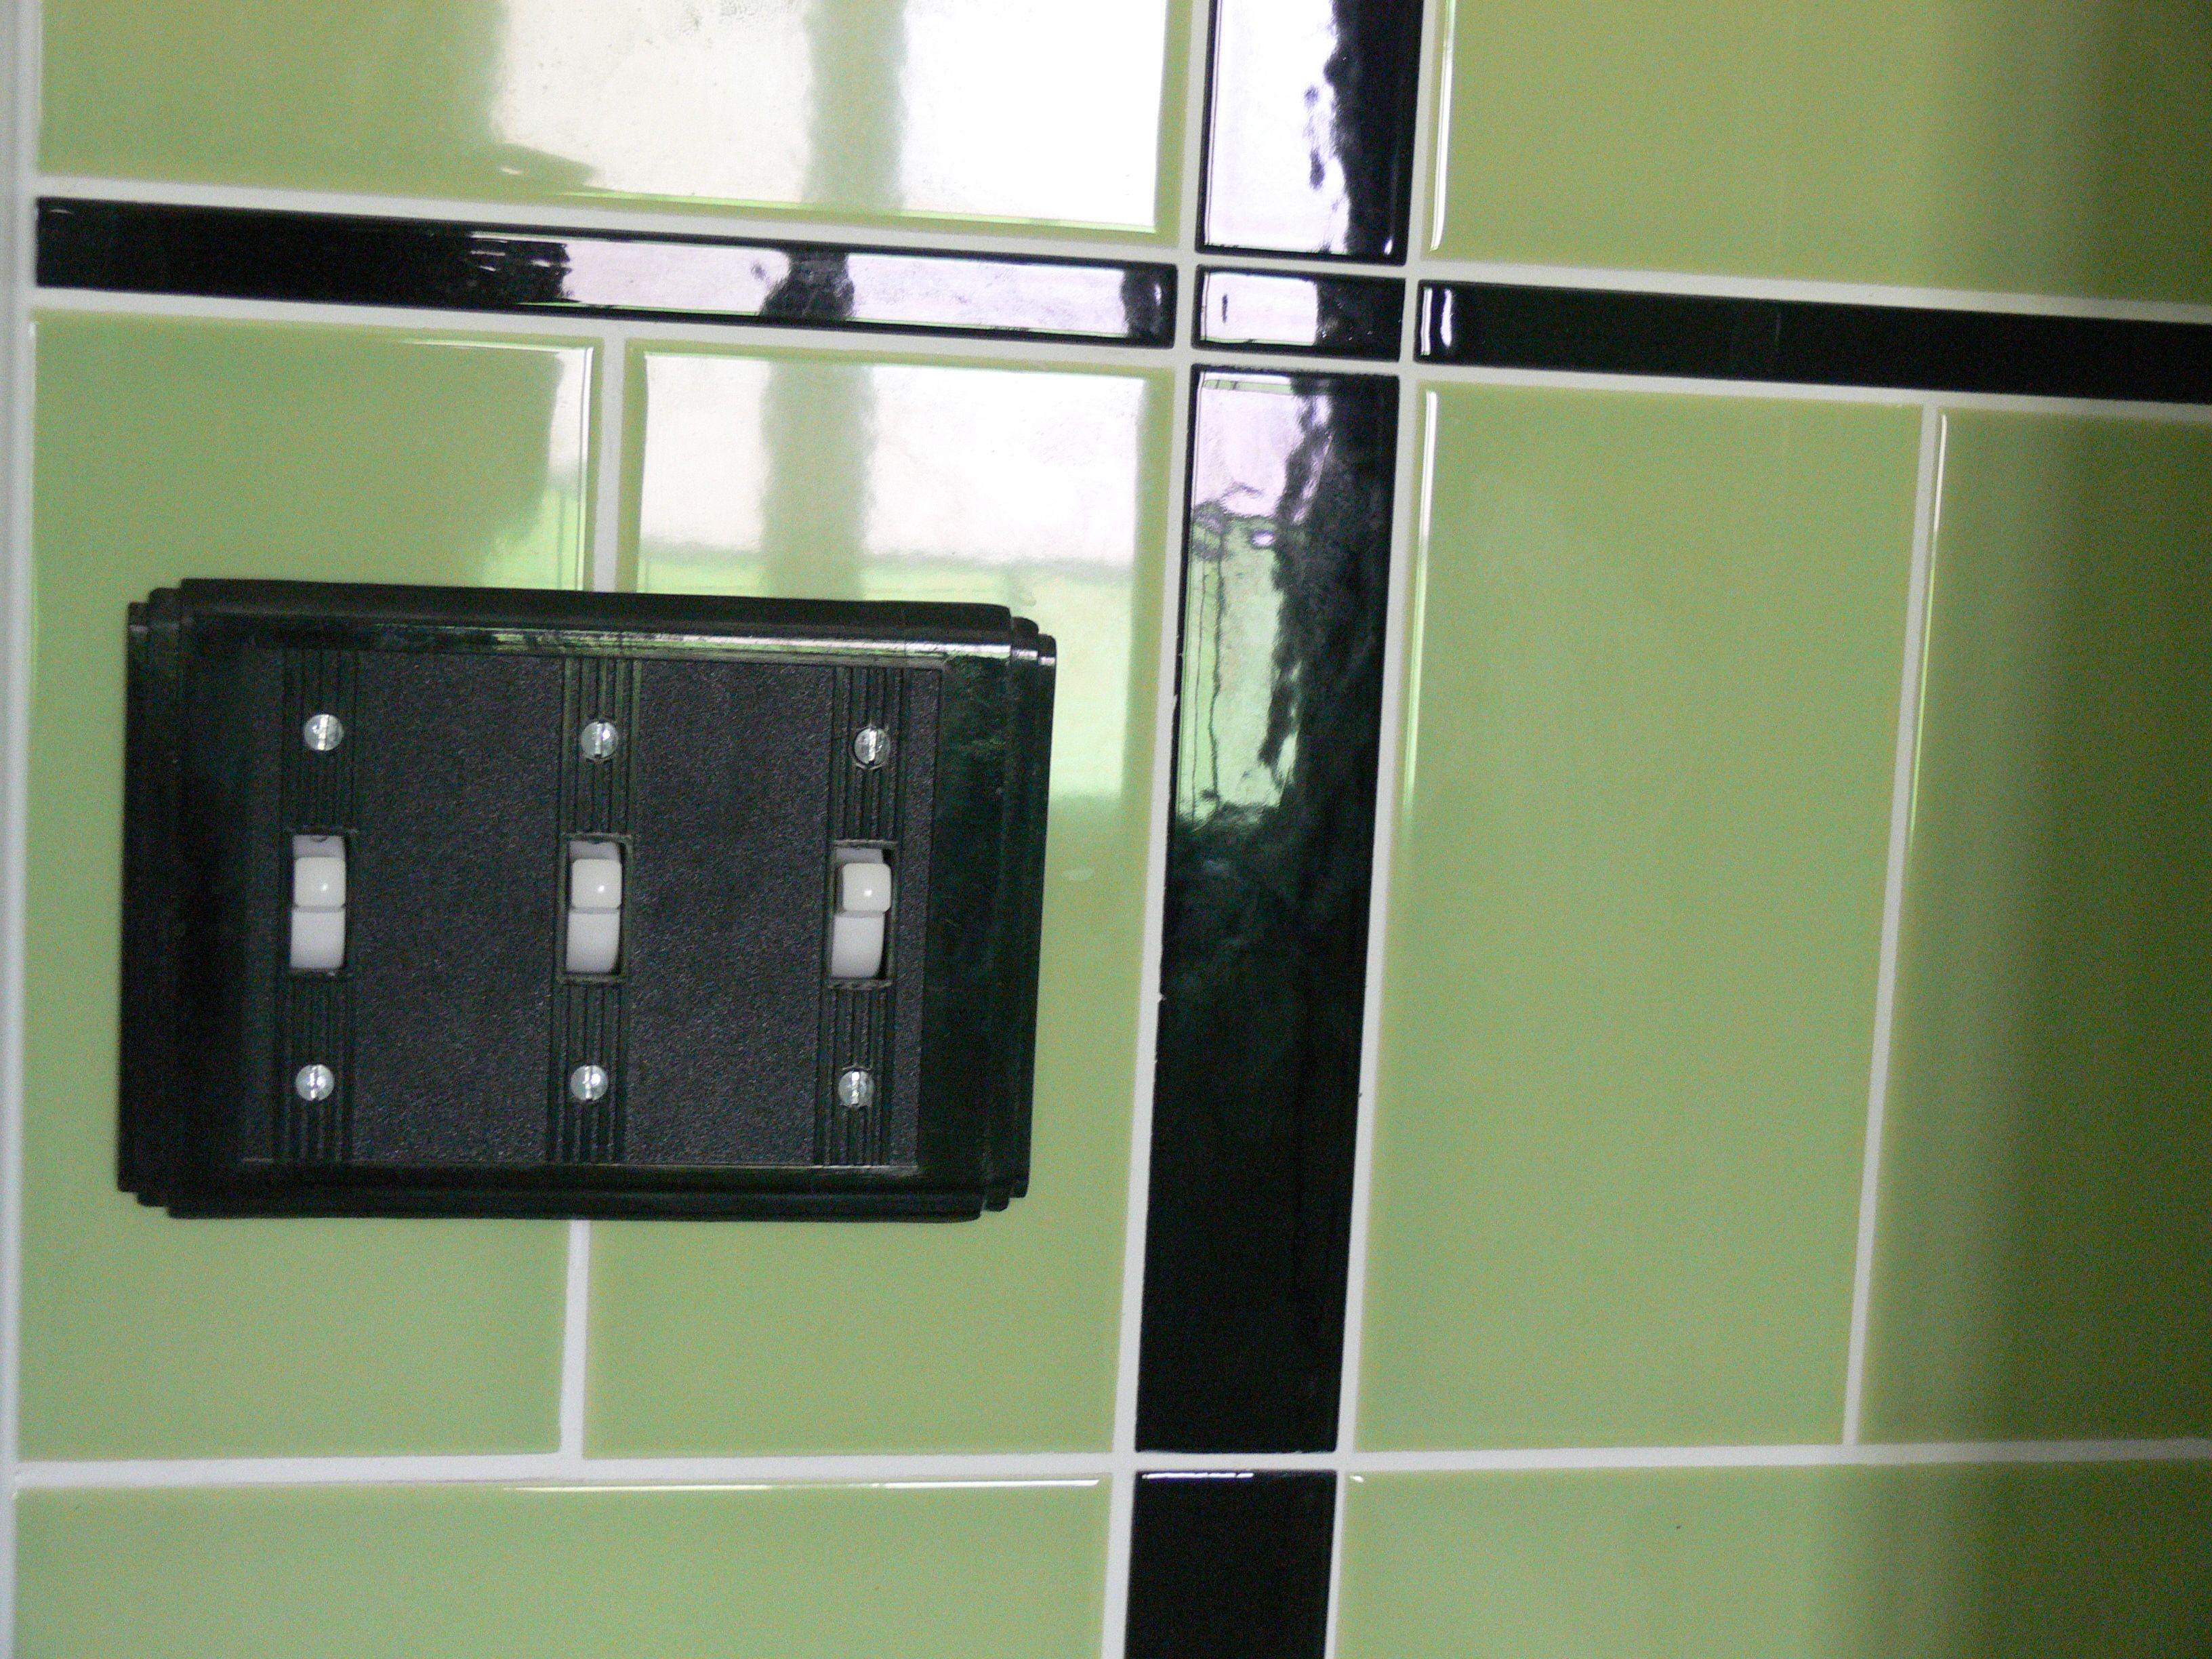 Details of our art deco bathroom. Re-manufactured bakelite light ...